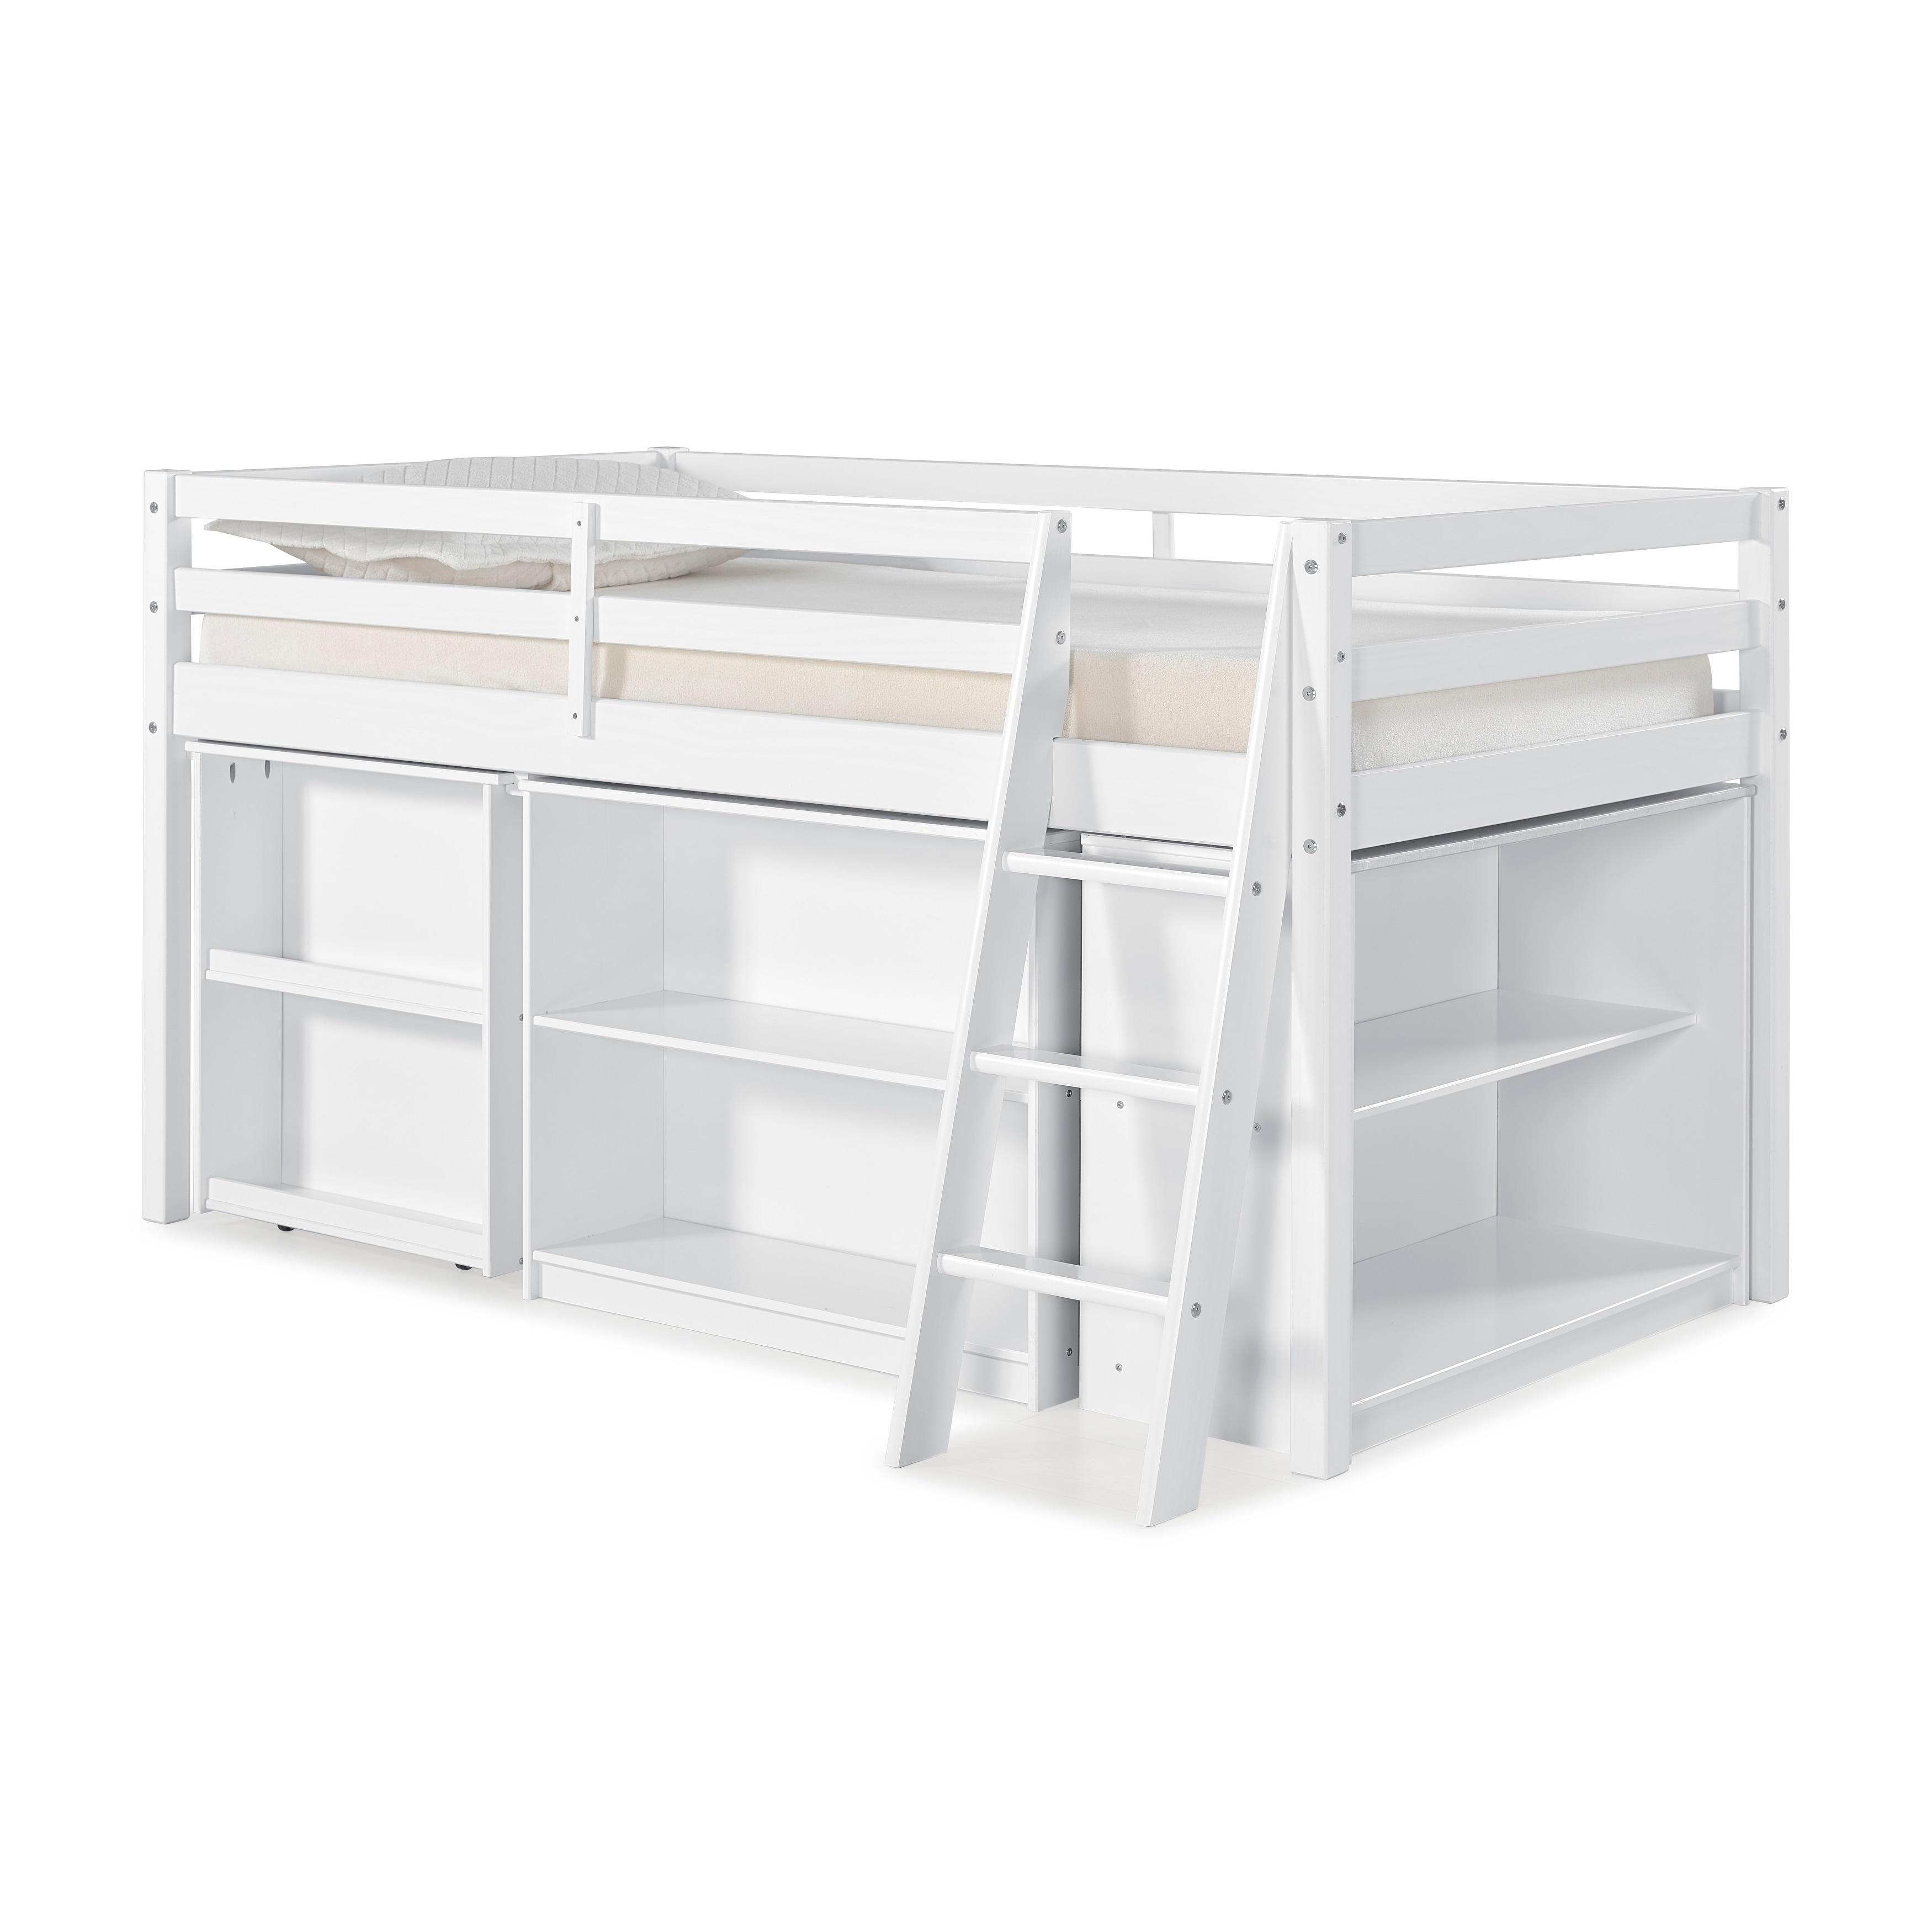 Roxy Junior Loft Bed with Storage Drawers Bookshelf and Desk White